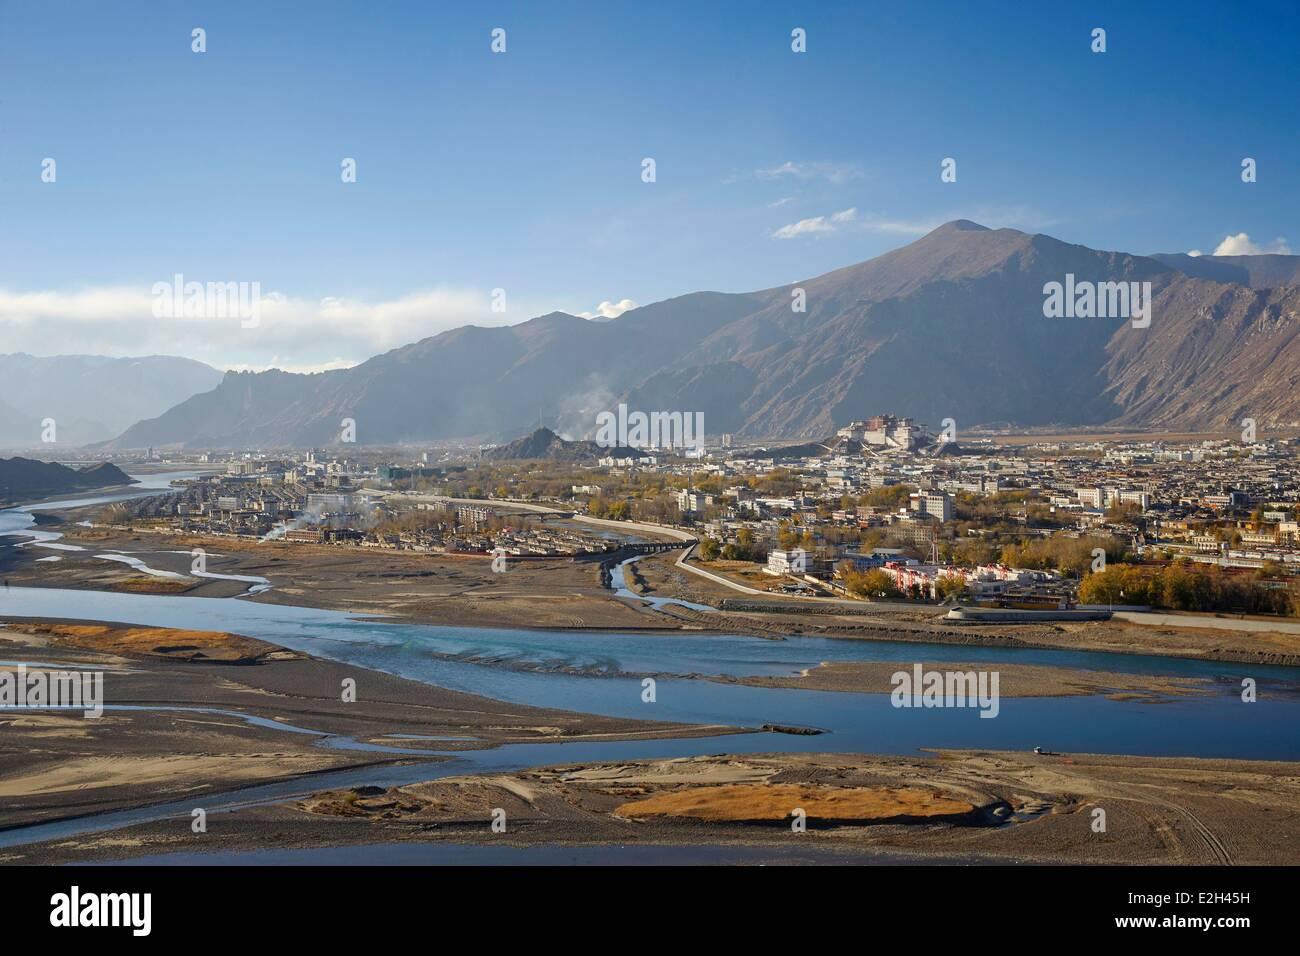 China Tibet Lhassa city of Lhasa and Potala palace - Stock Image